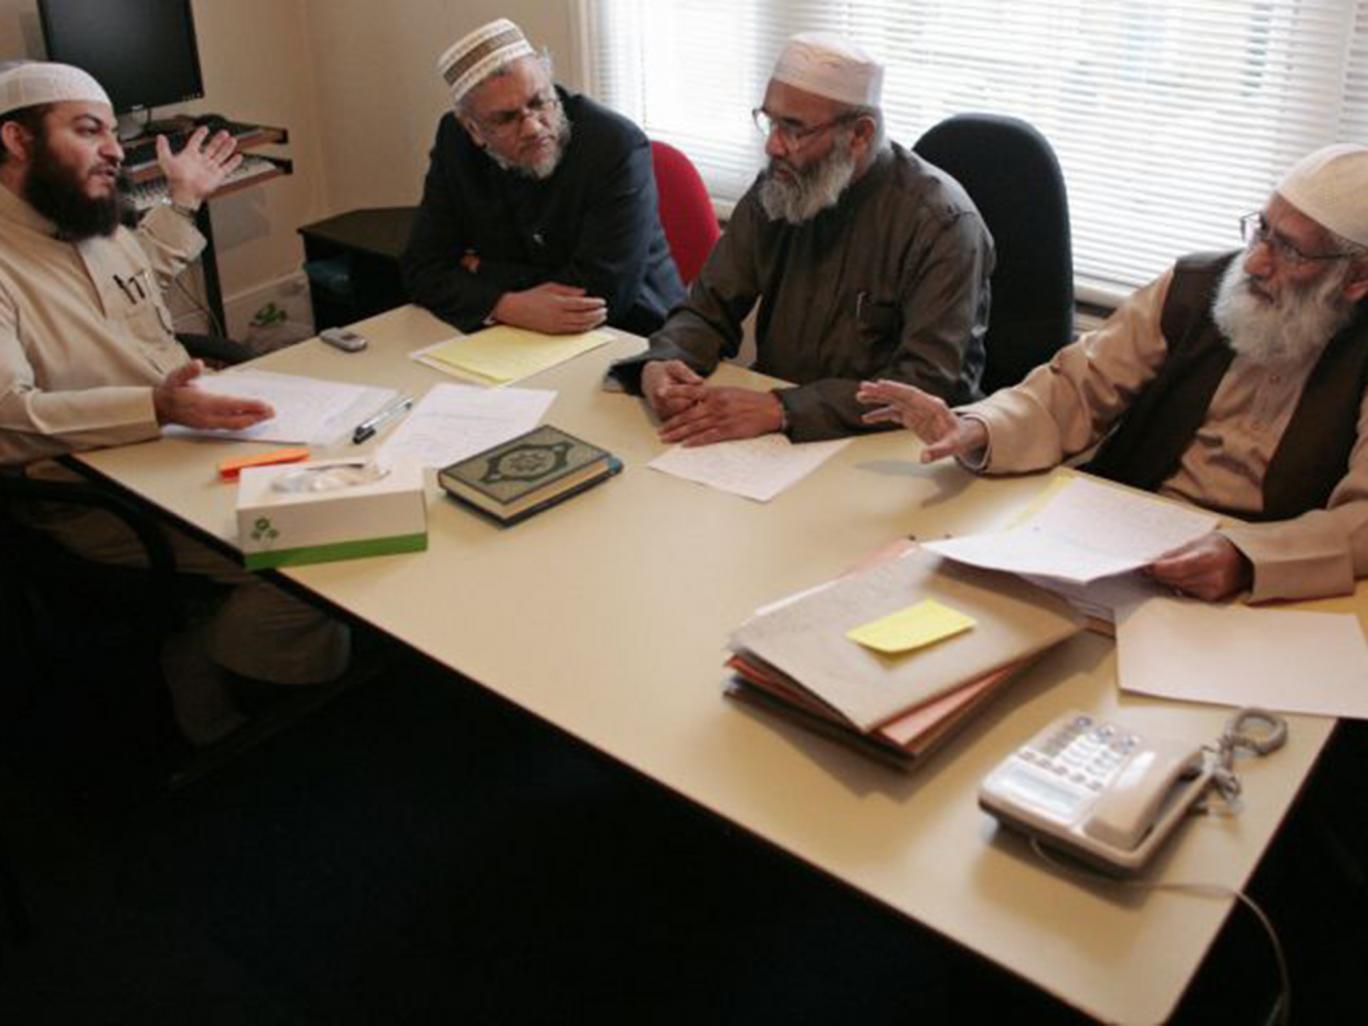 tribunal-islamique-en-europe